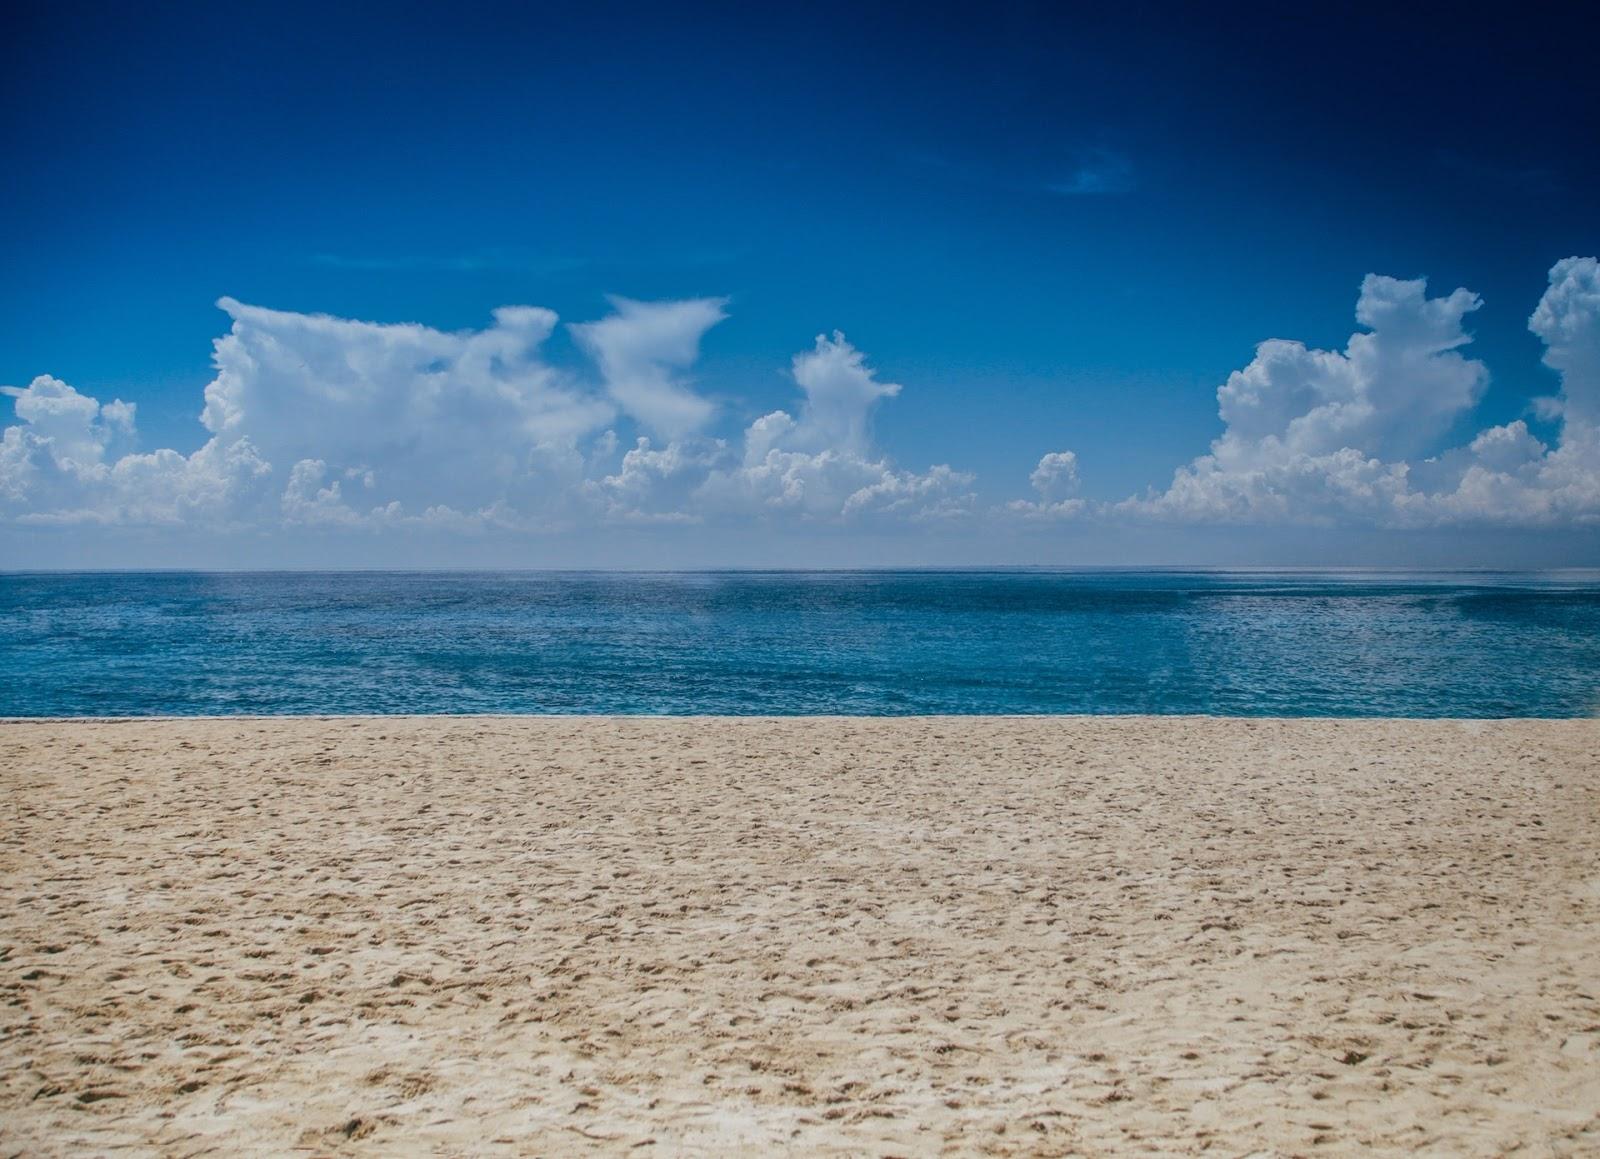 740 Koleksi Gambar Pemandangan Pantai Asli HD